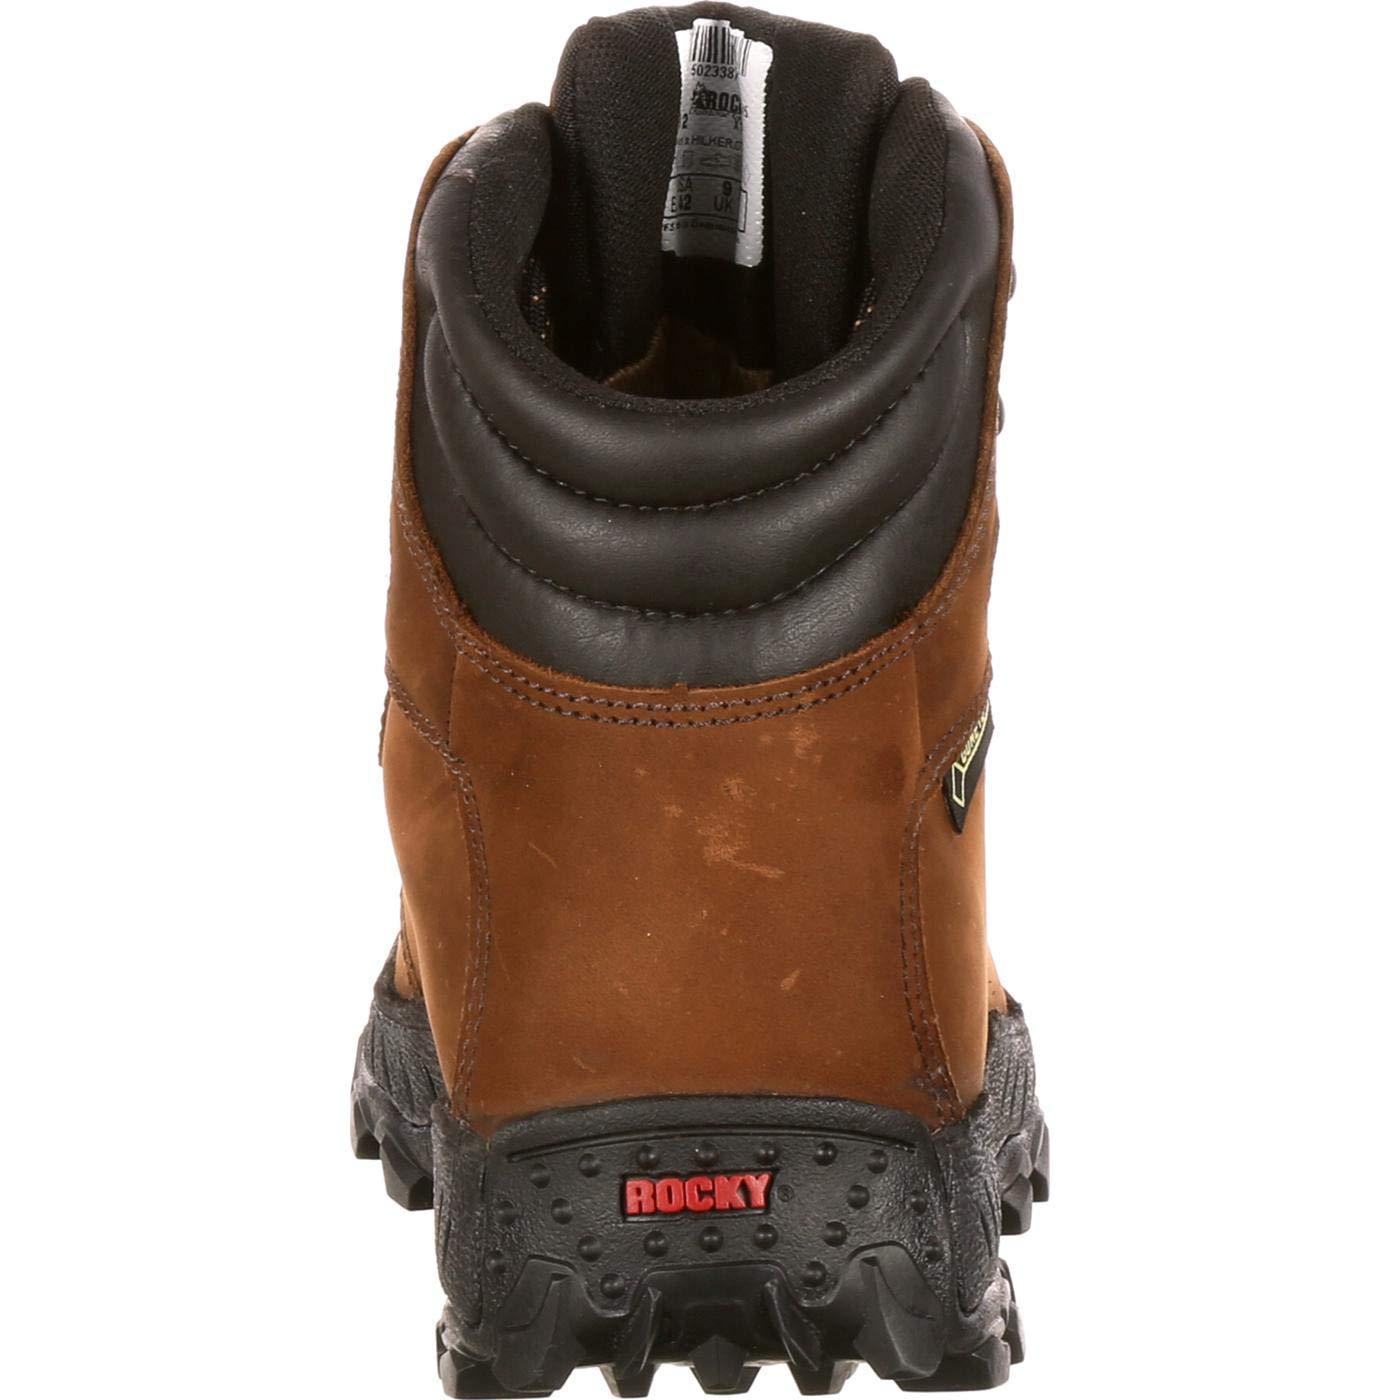 Rocky Creek Bottom Gore-Tex Waterproof Hiker Boot